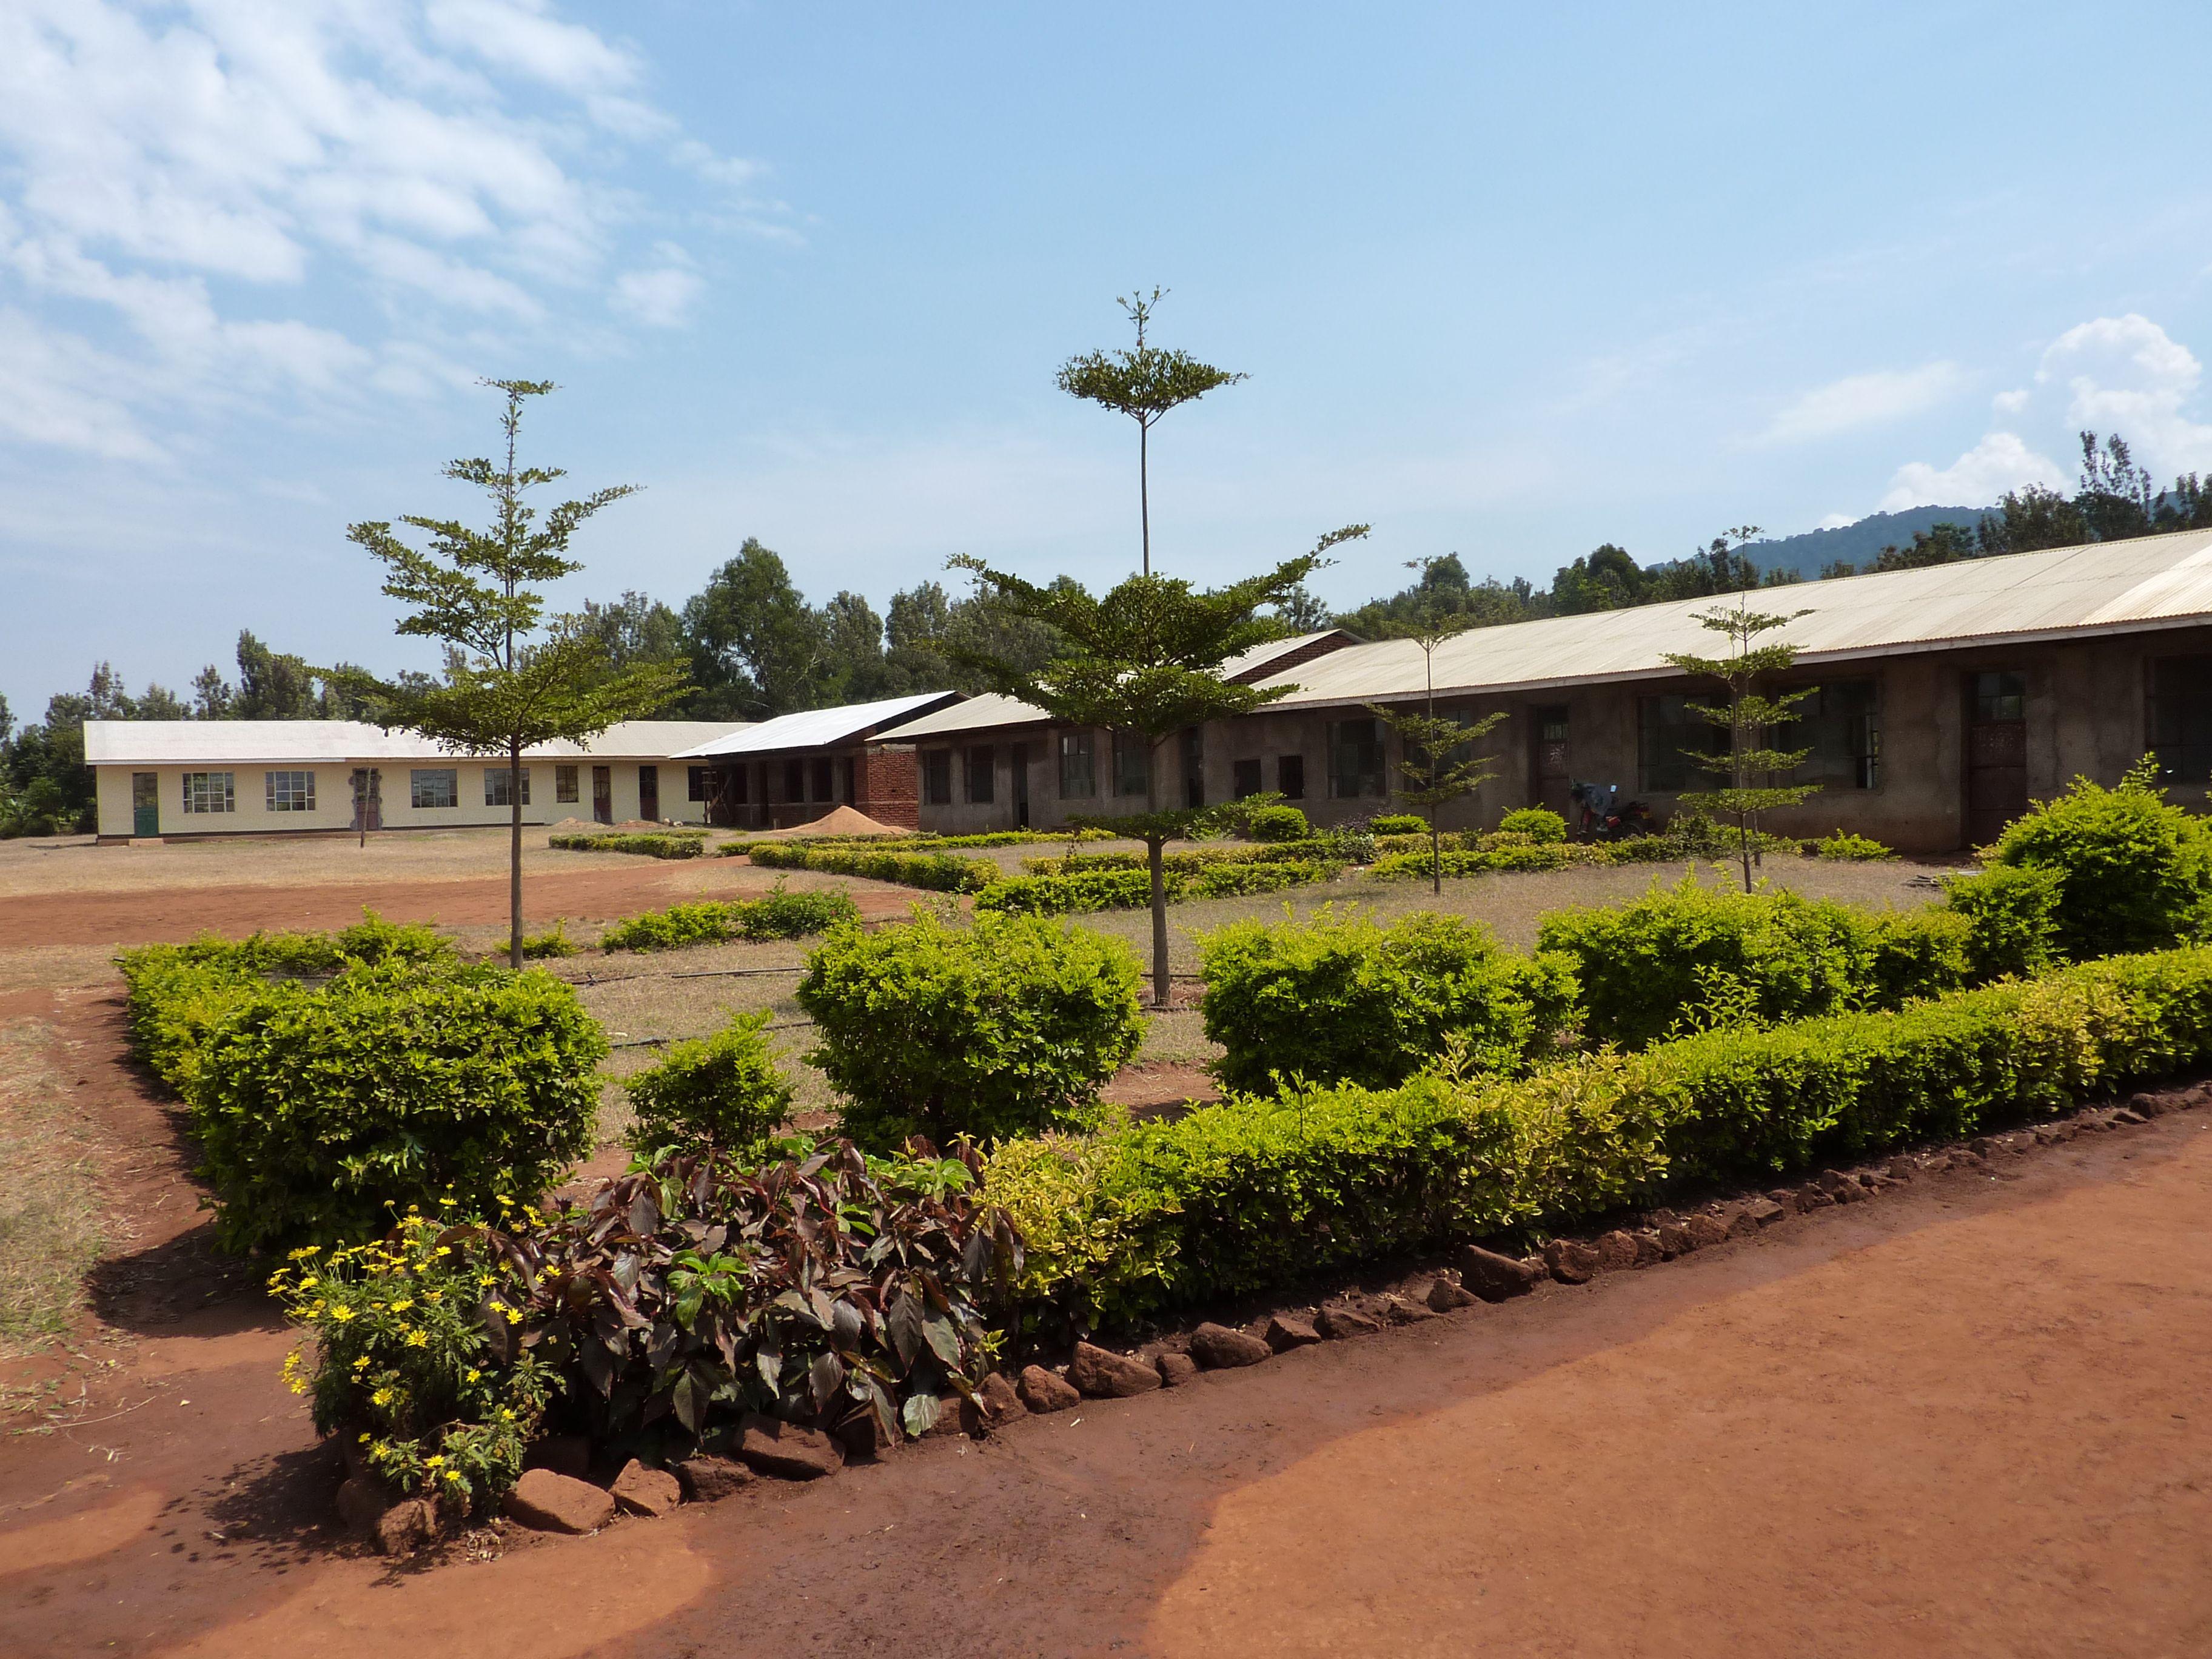 2013-09-20-KarimuAyalagayasecondaryschool.jpg